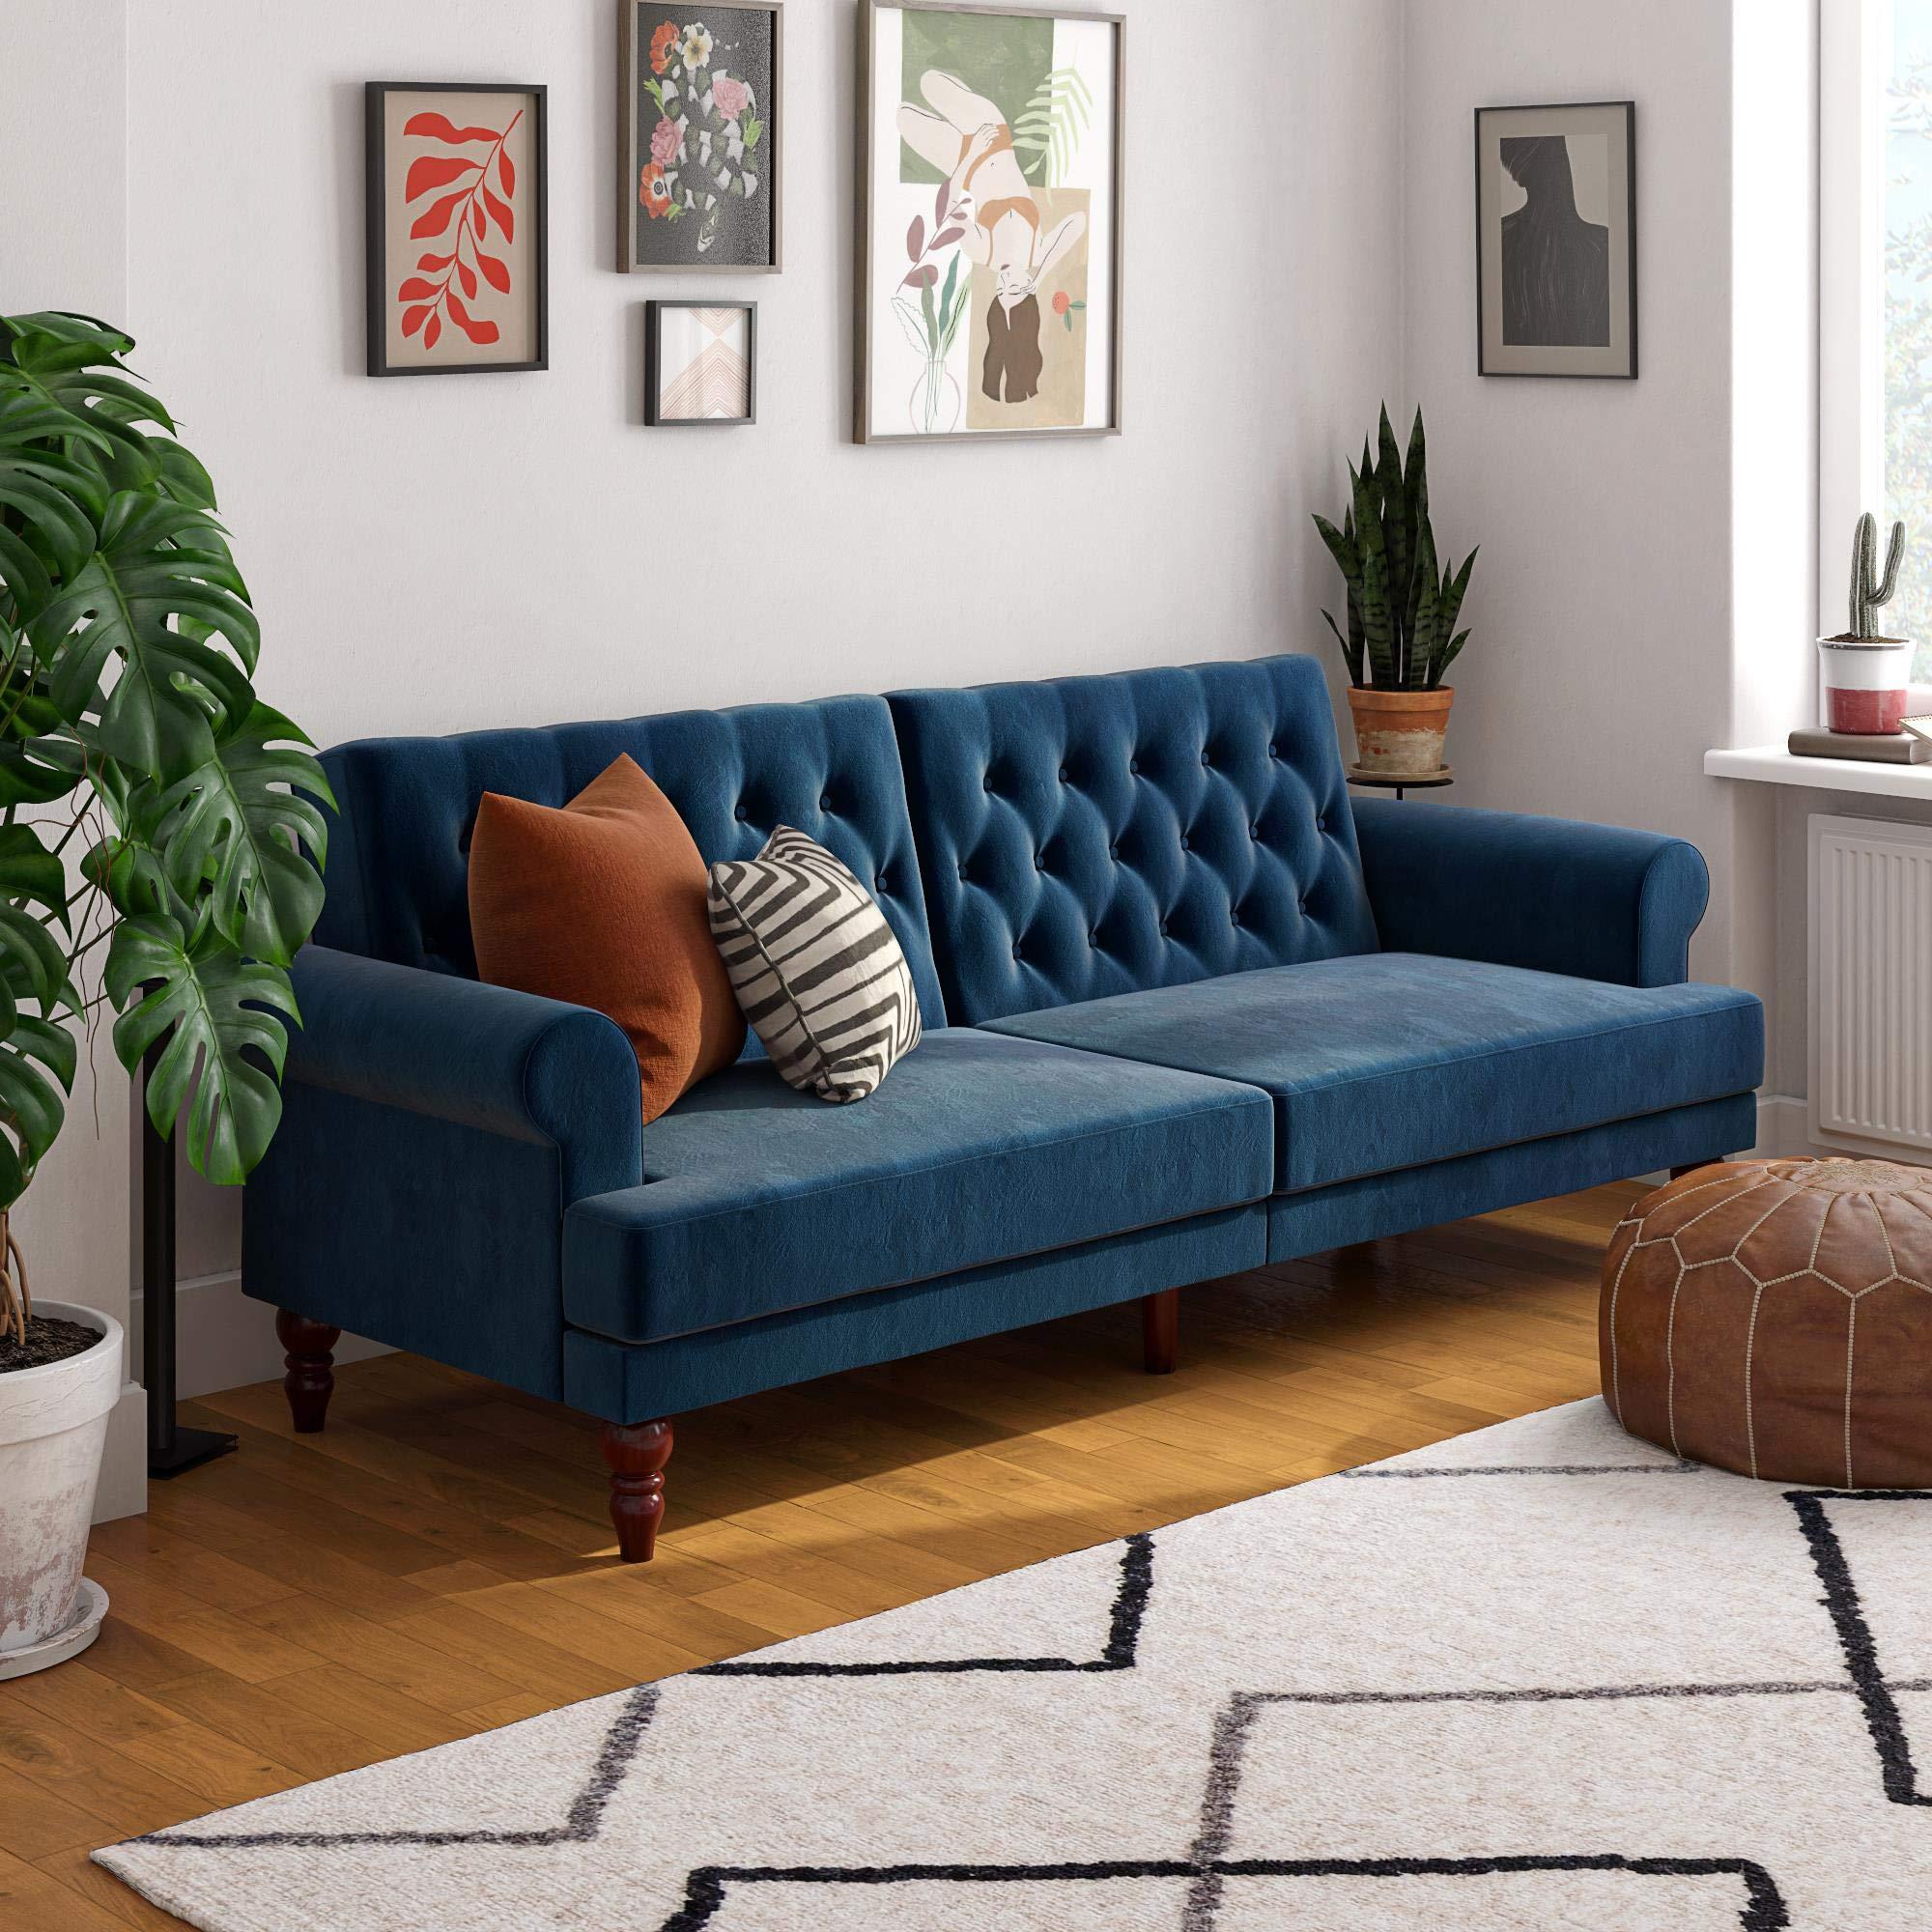 Novogratz Upholstered Cassidy, Convertible Sofa Bed, Blue Velvet Futon by Novogratz